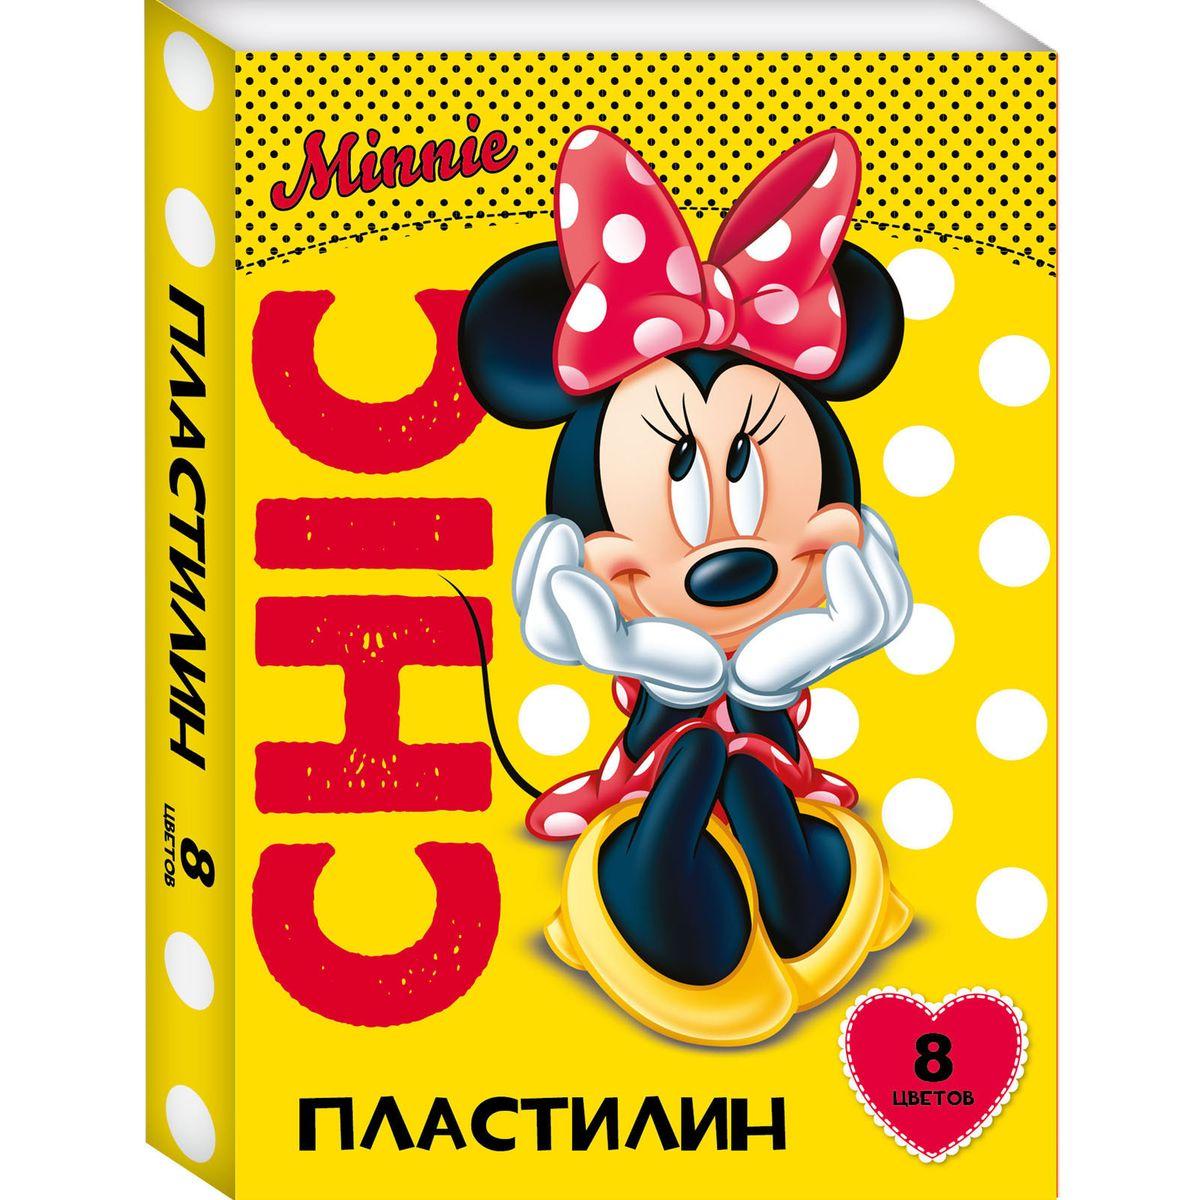 Disney Пластилин Минни 8 цветов росмэн минни